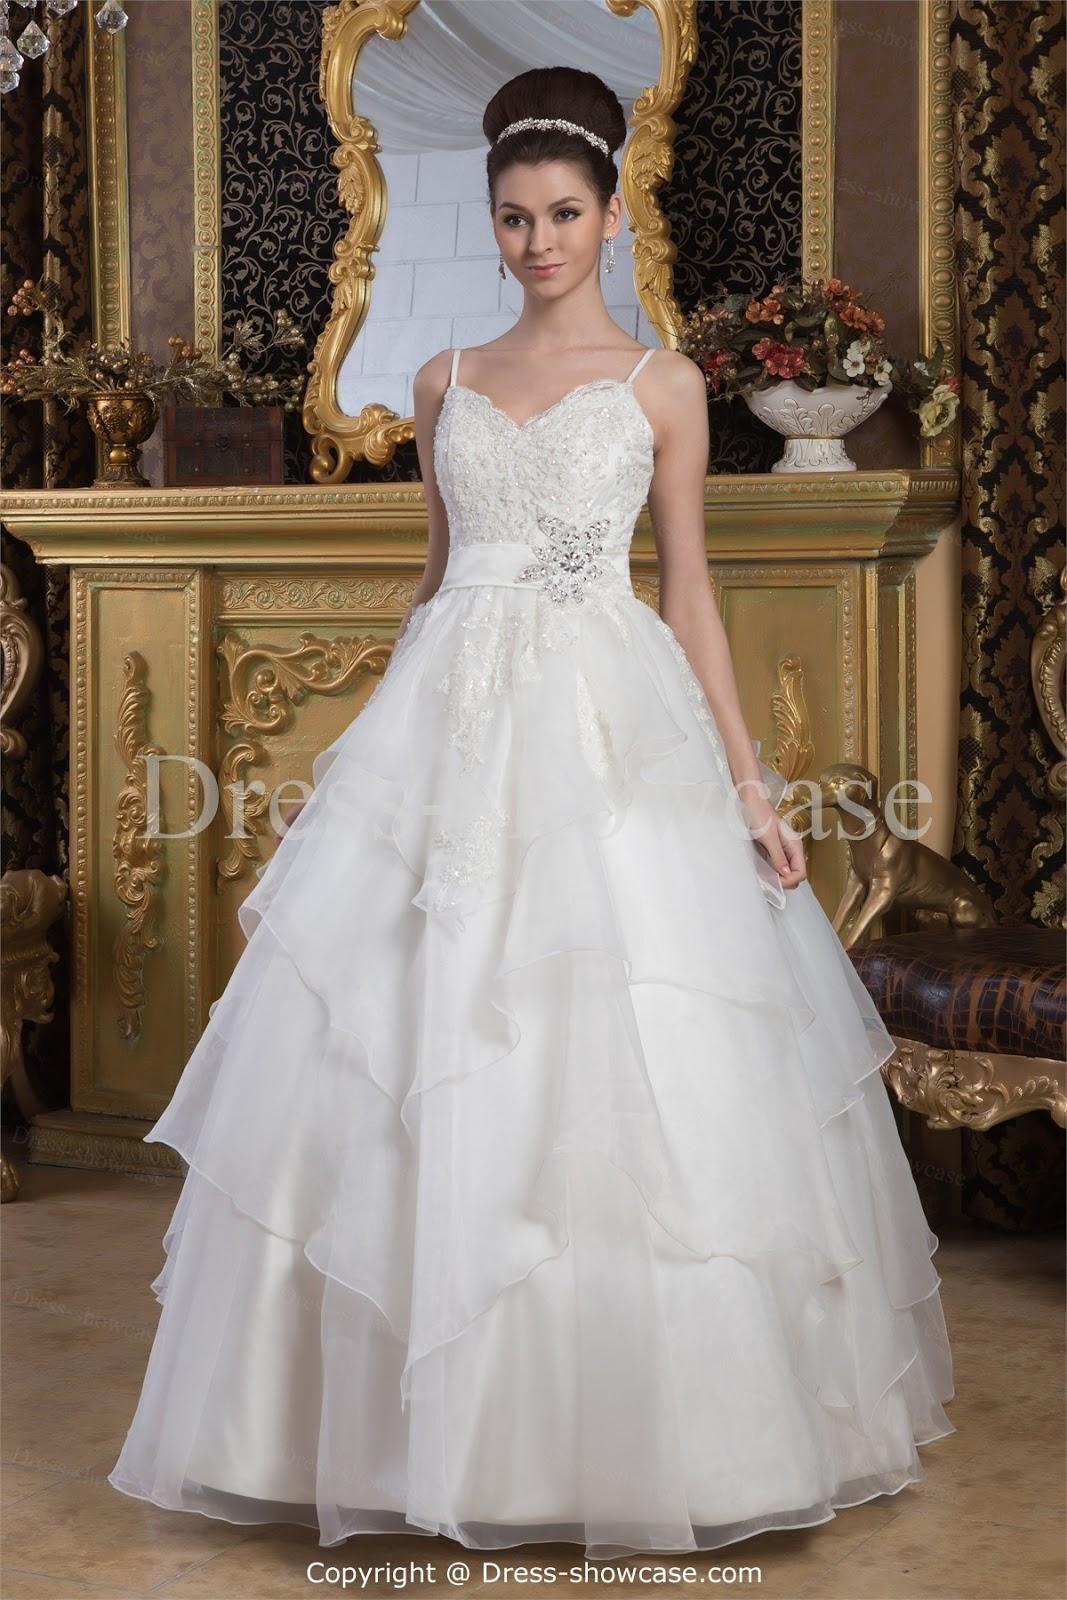 wedding dresses for women photo - 1